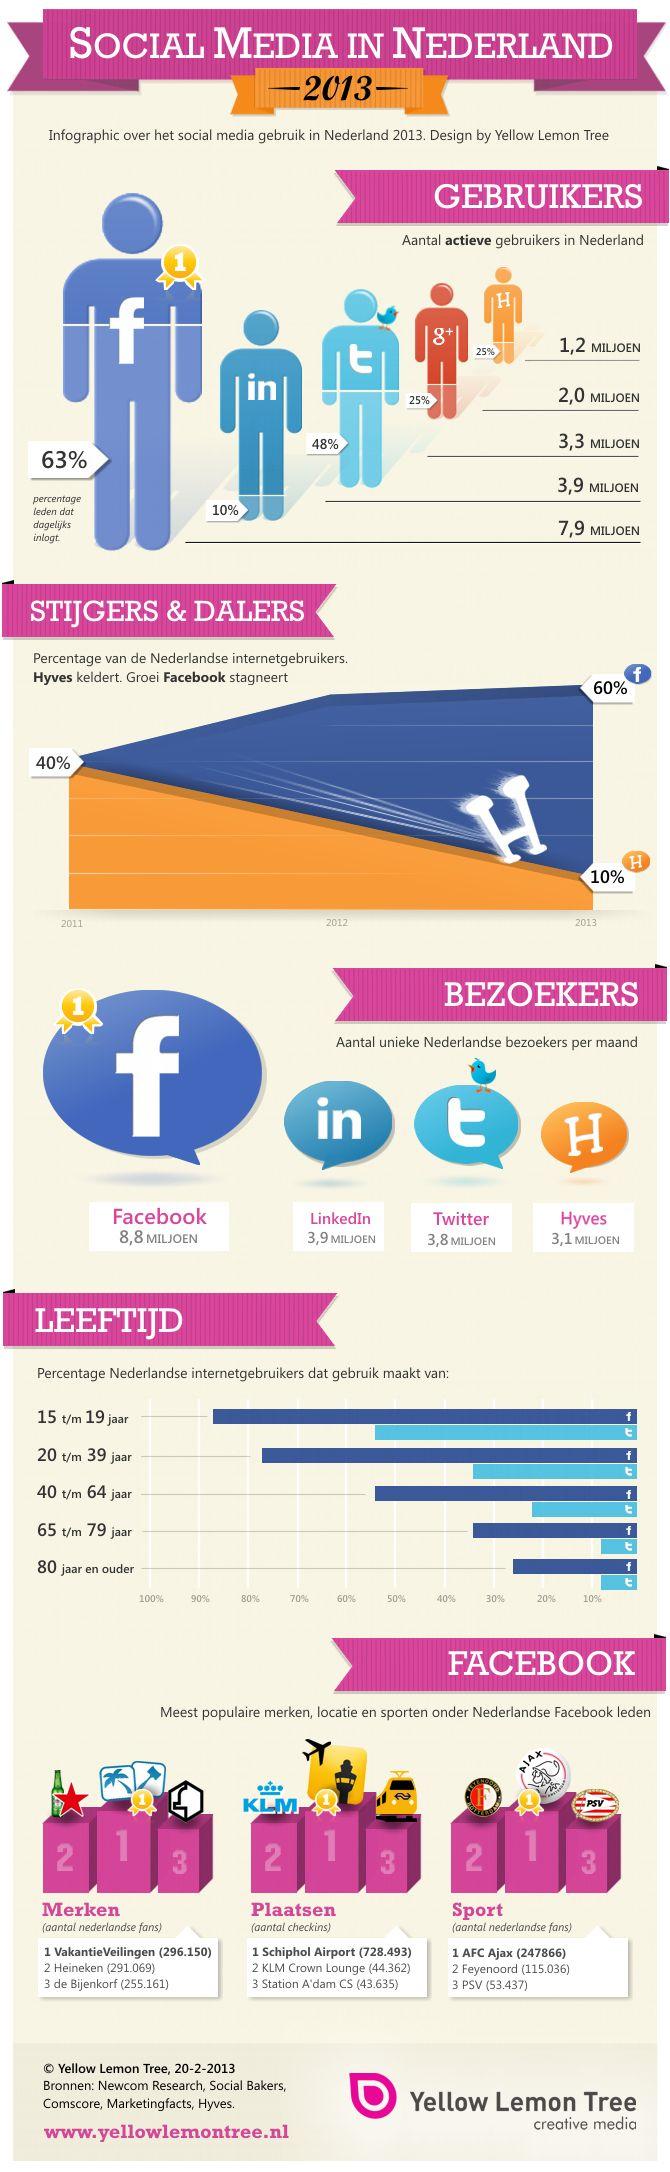 Social media in Nederland 2013